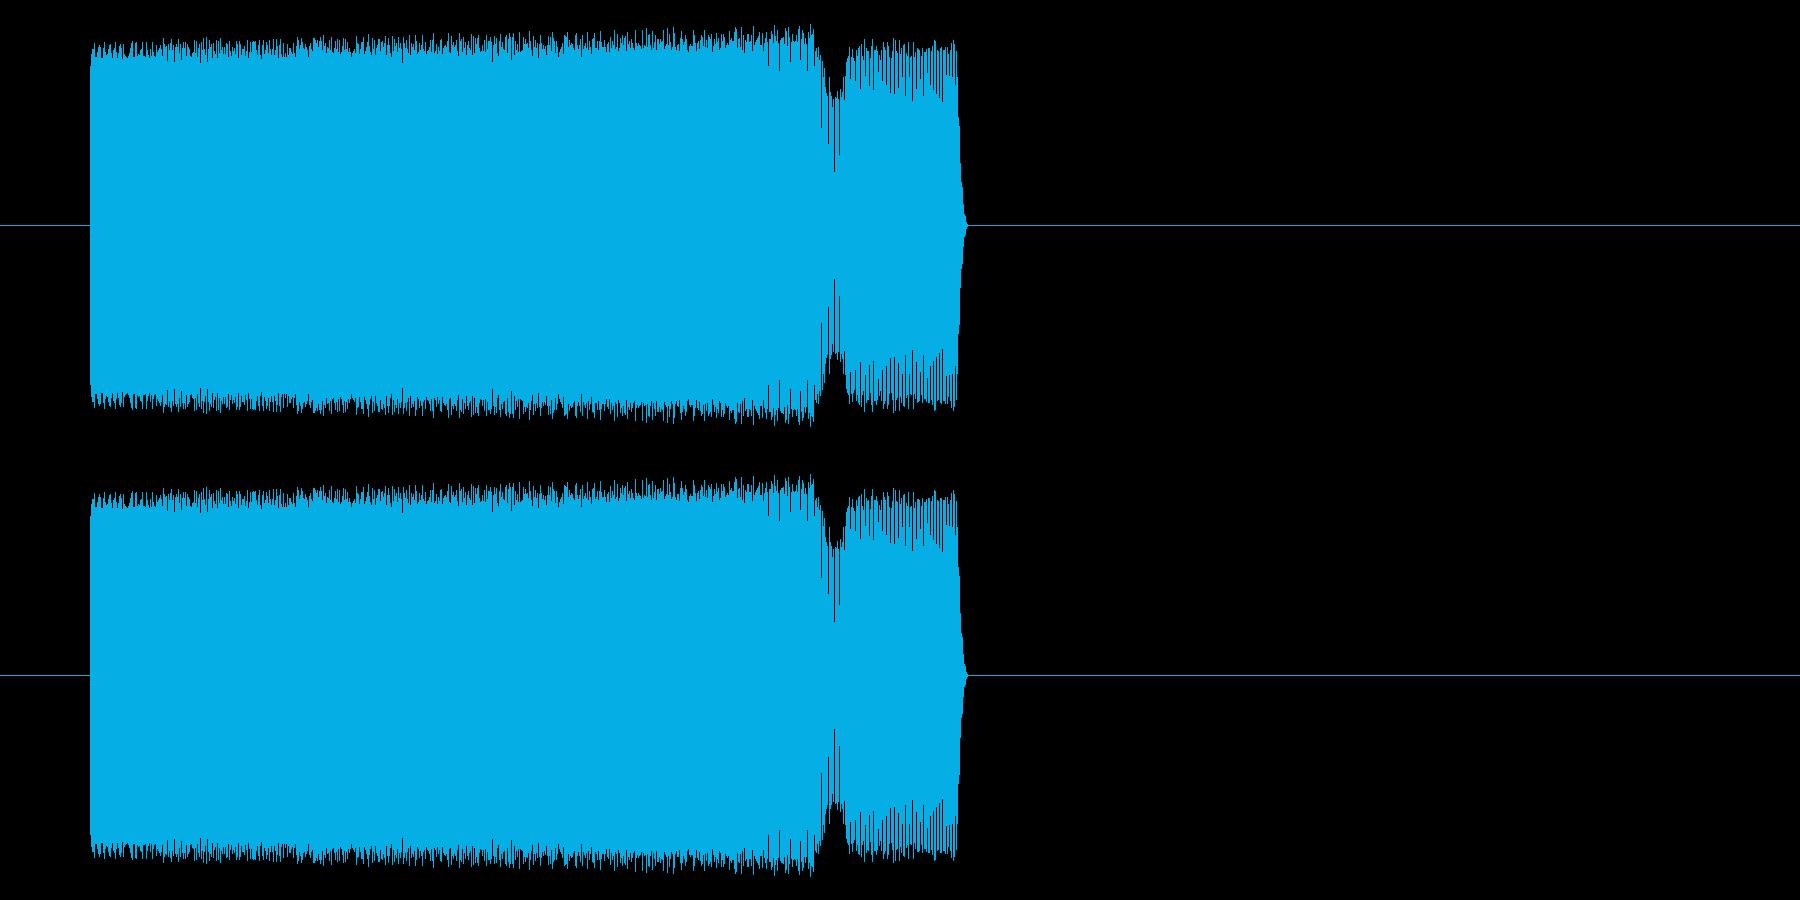 【NES RPG02-04(ワープ)】の再生済みの波形